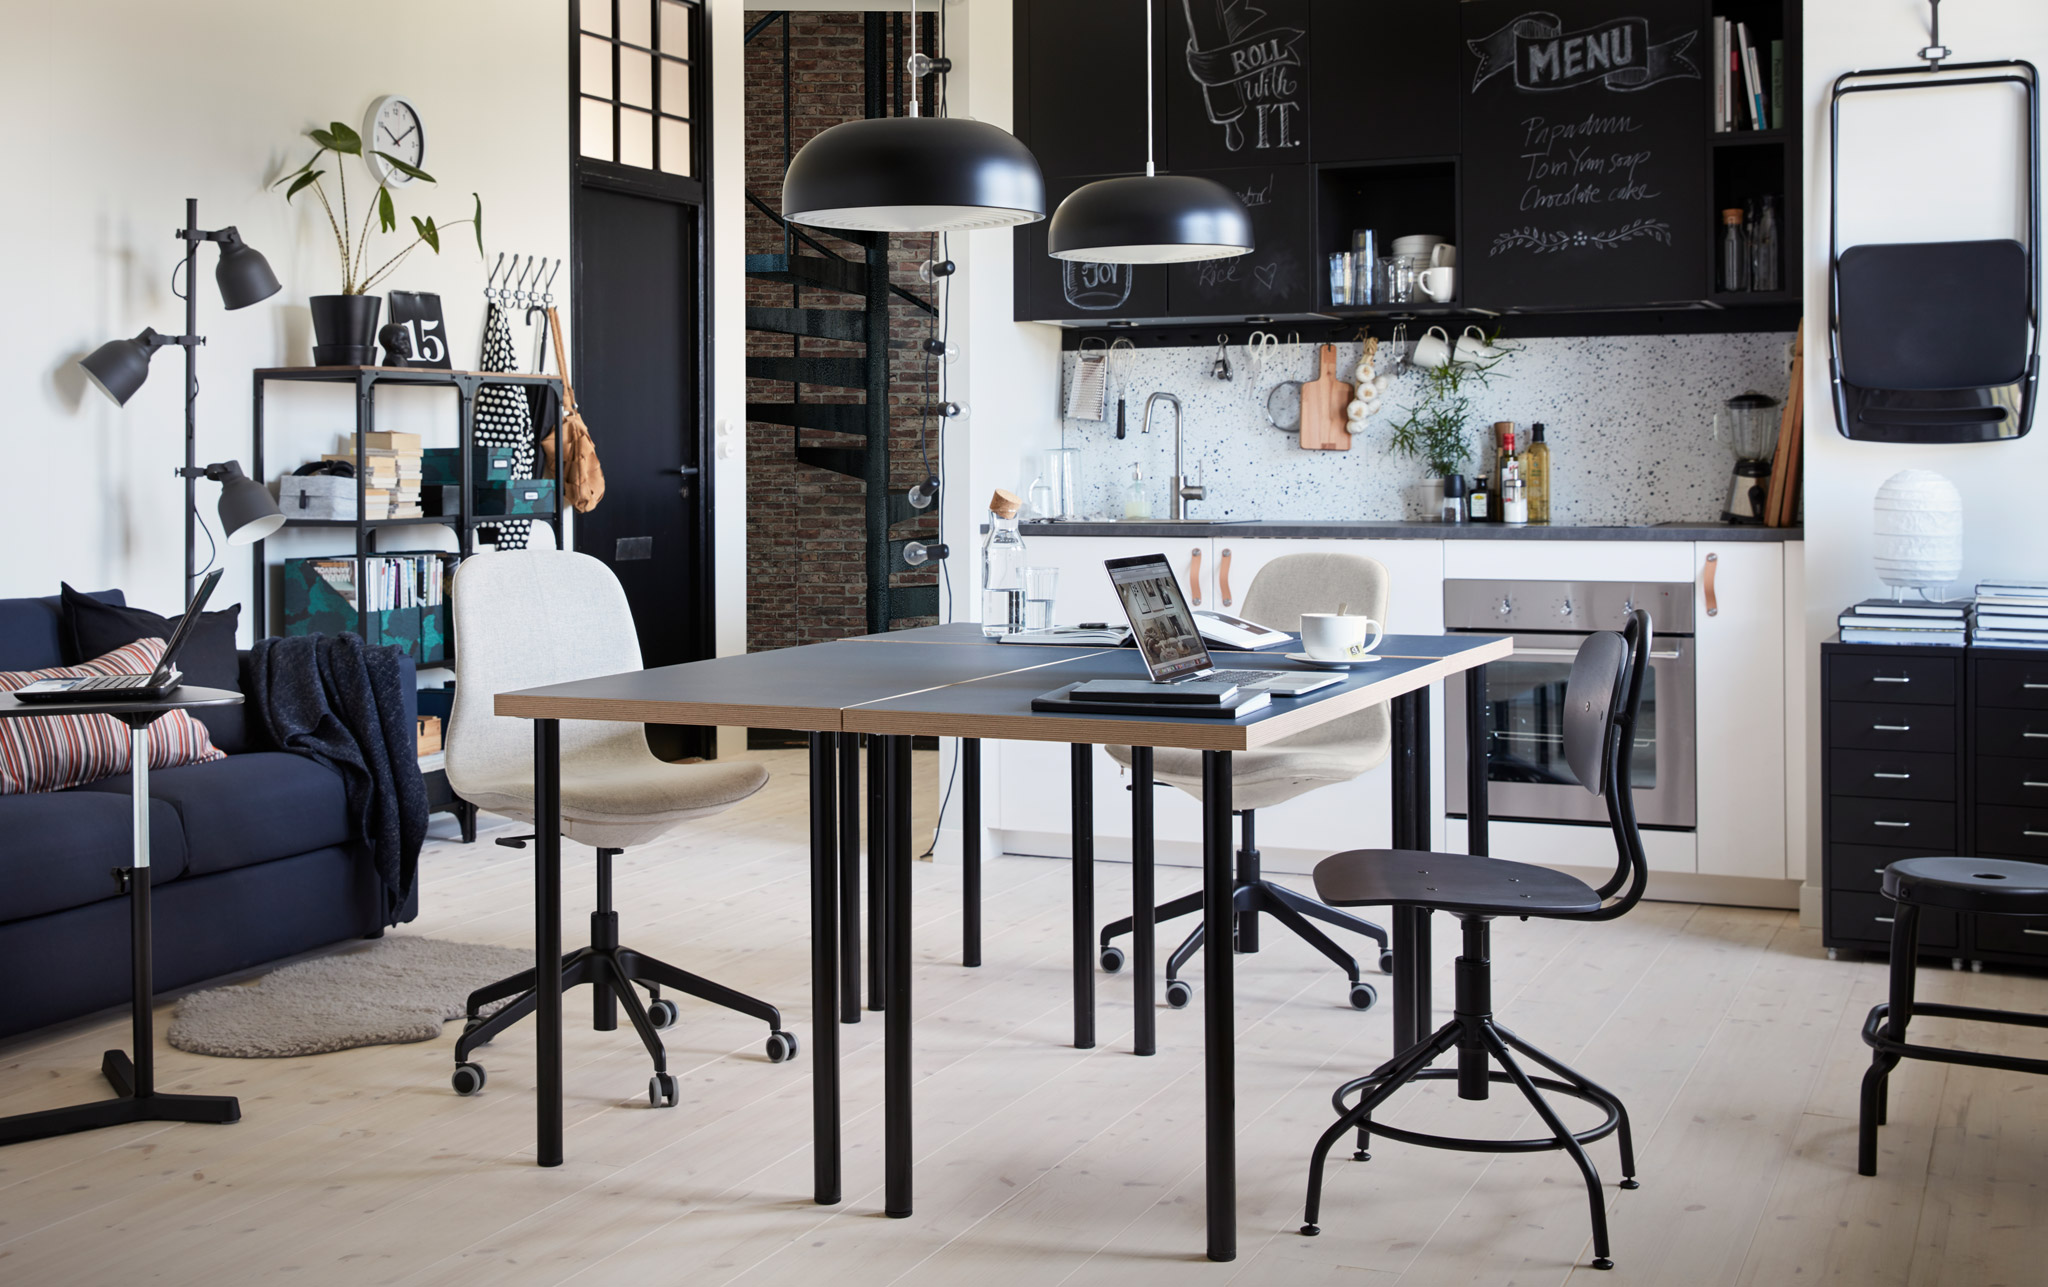 Ikea Ufficio In Casa : Fresco ikea arredo ufficio comicfencing